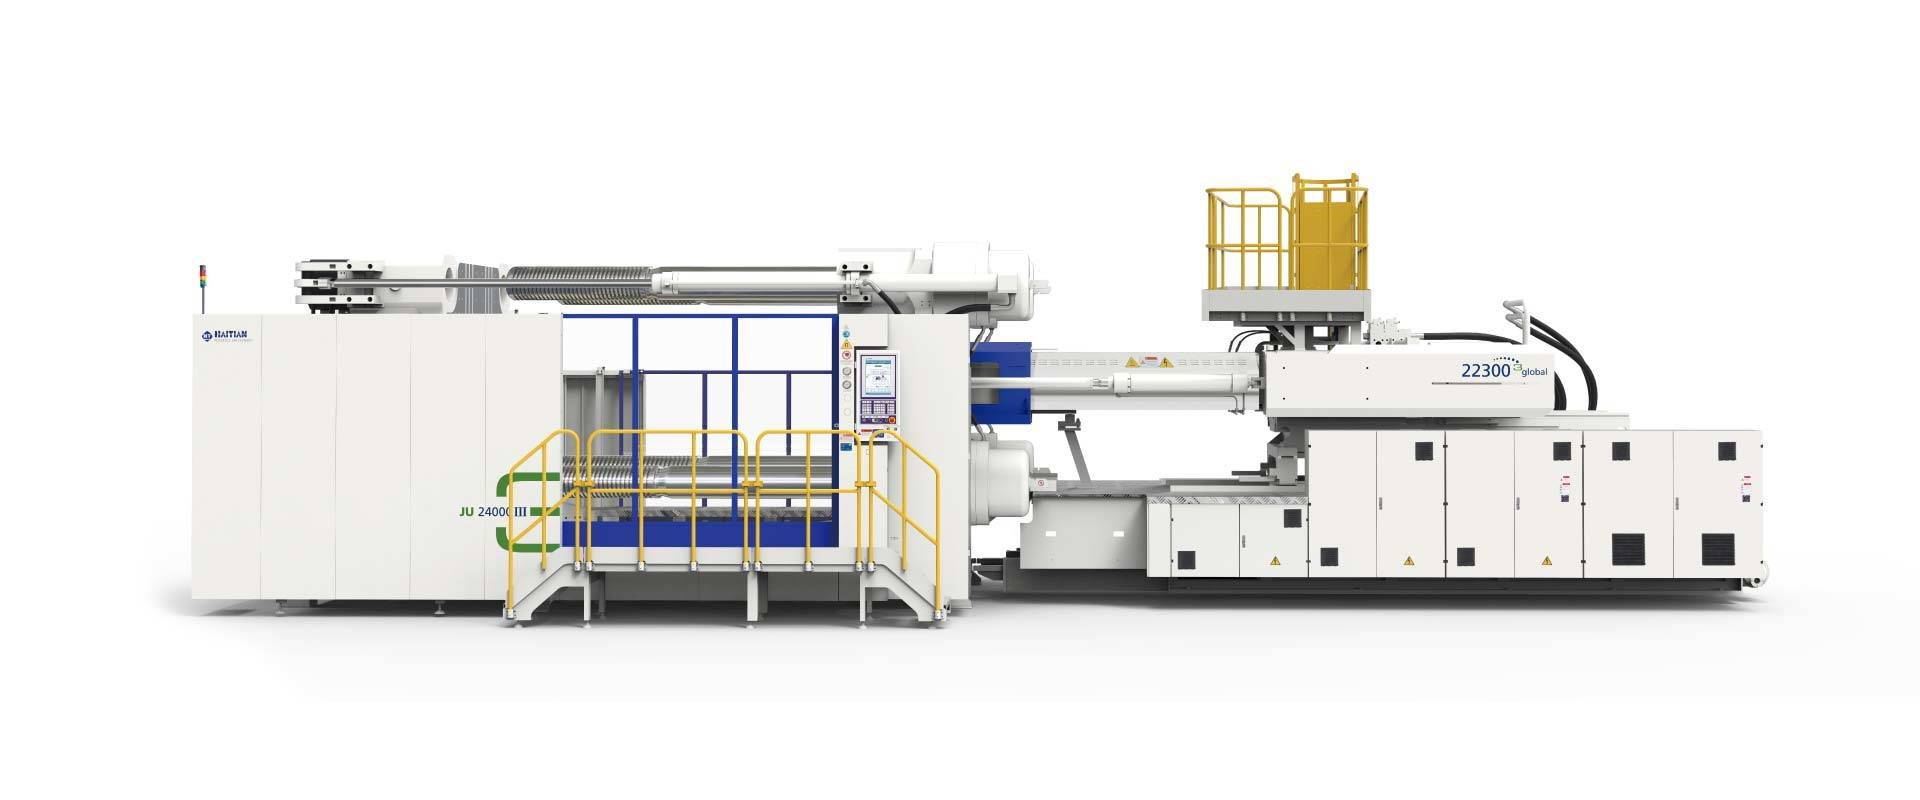 AKF plastics Haitian Jupiter 16000 III spuitgietmachine